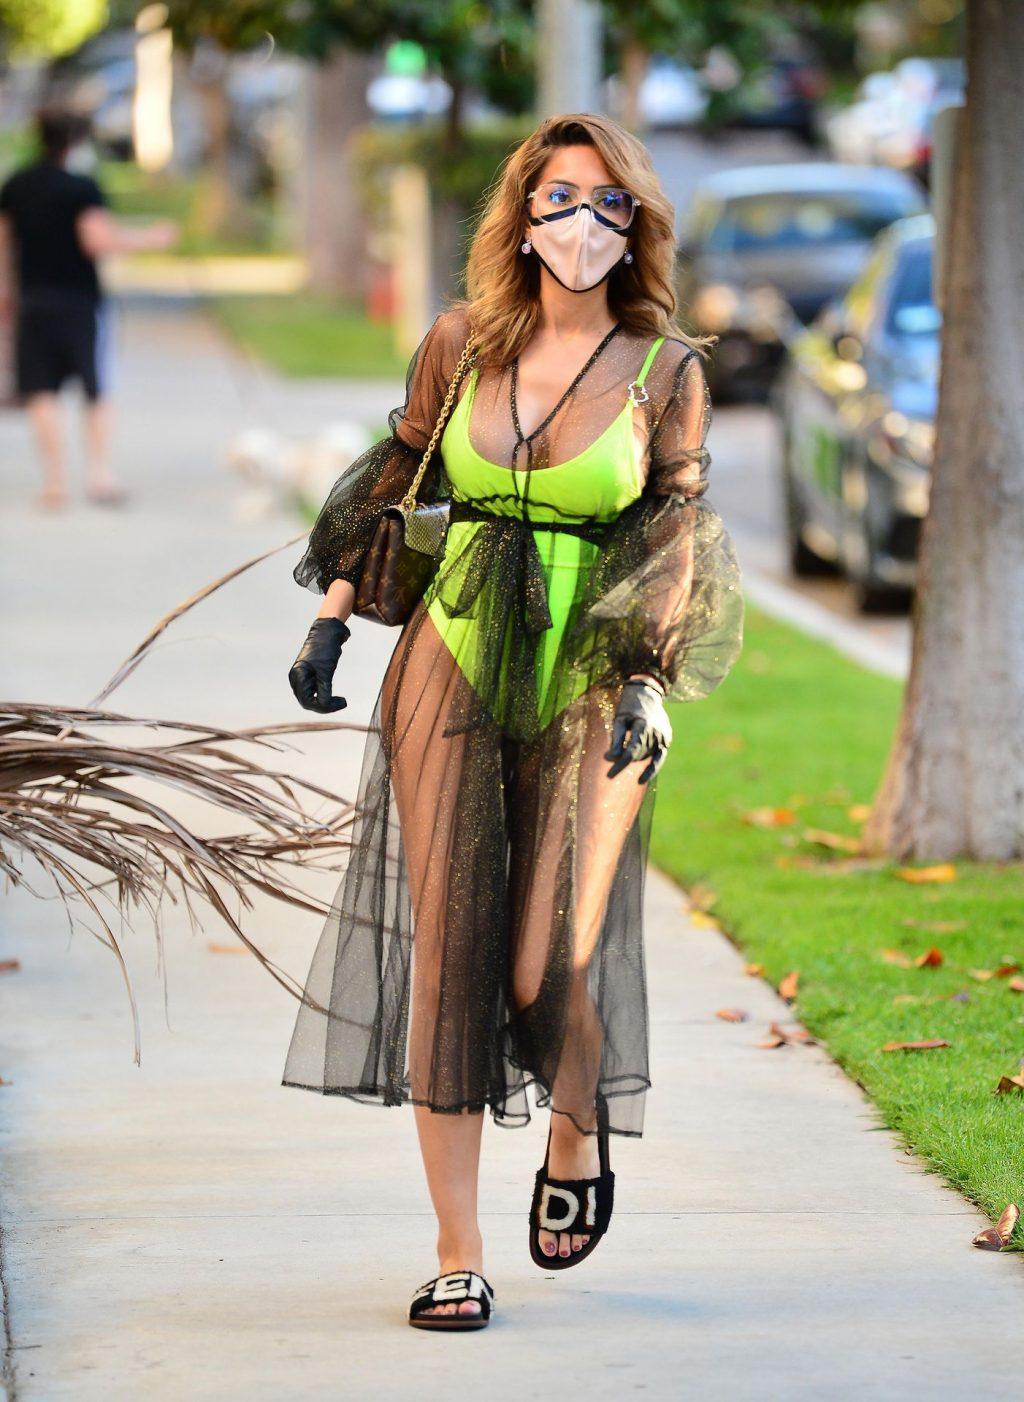 Farrah Abraham Reveals All in a Skimpy Bikini and Tutu (24 Photos)